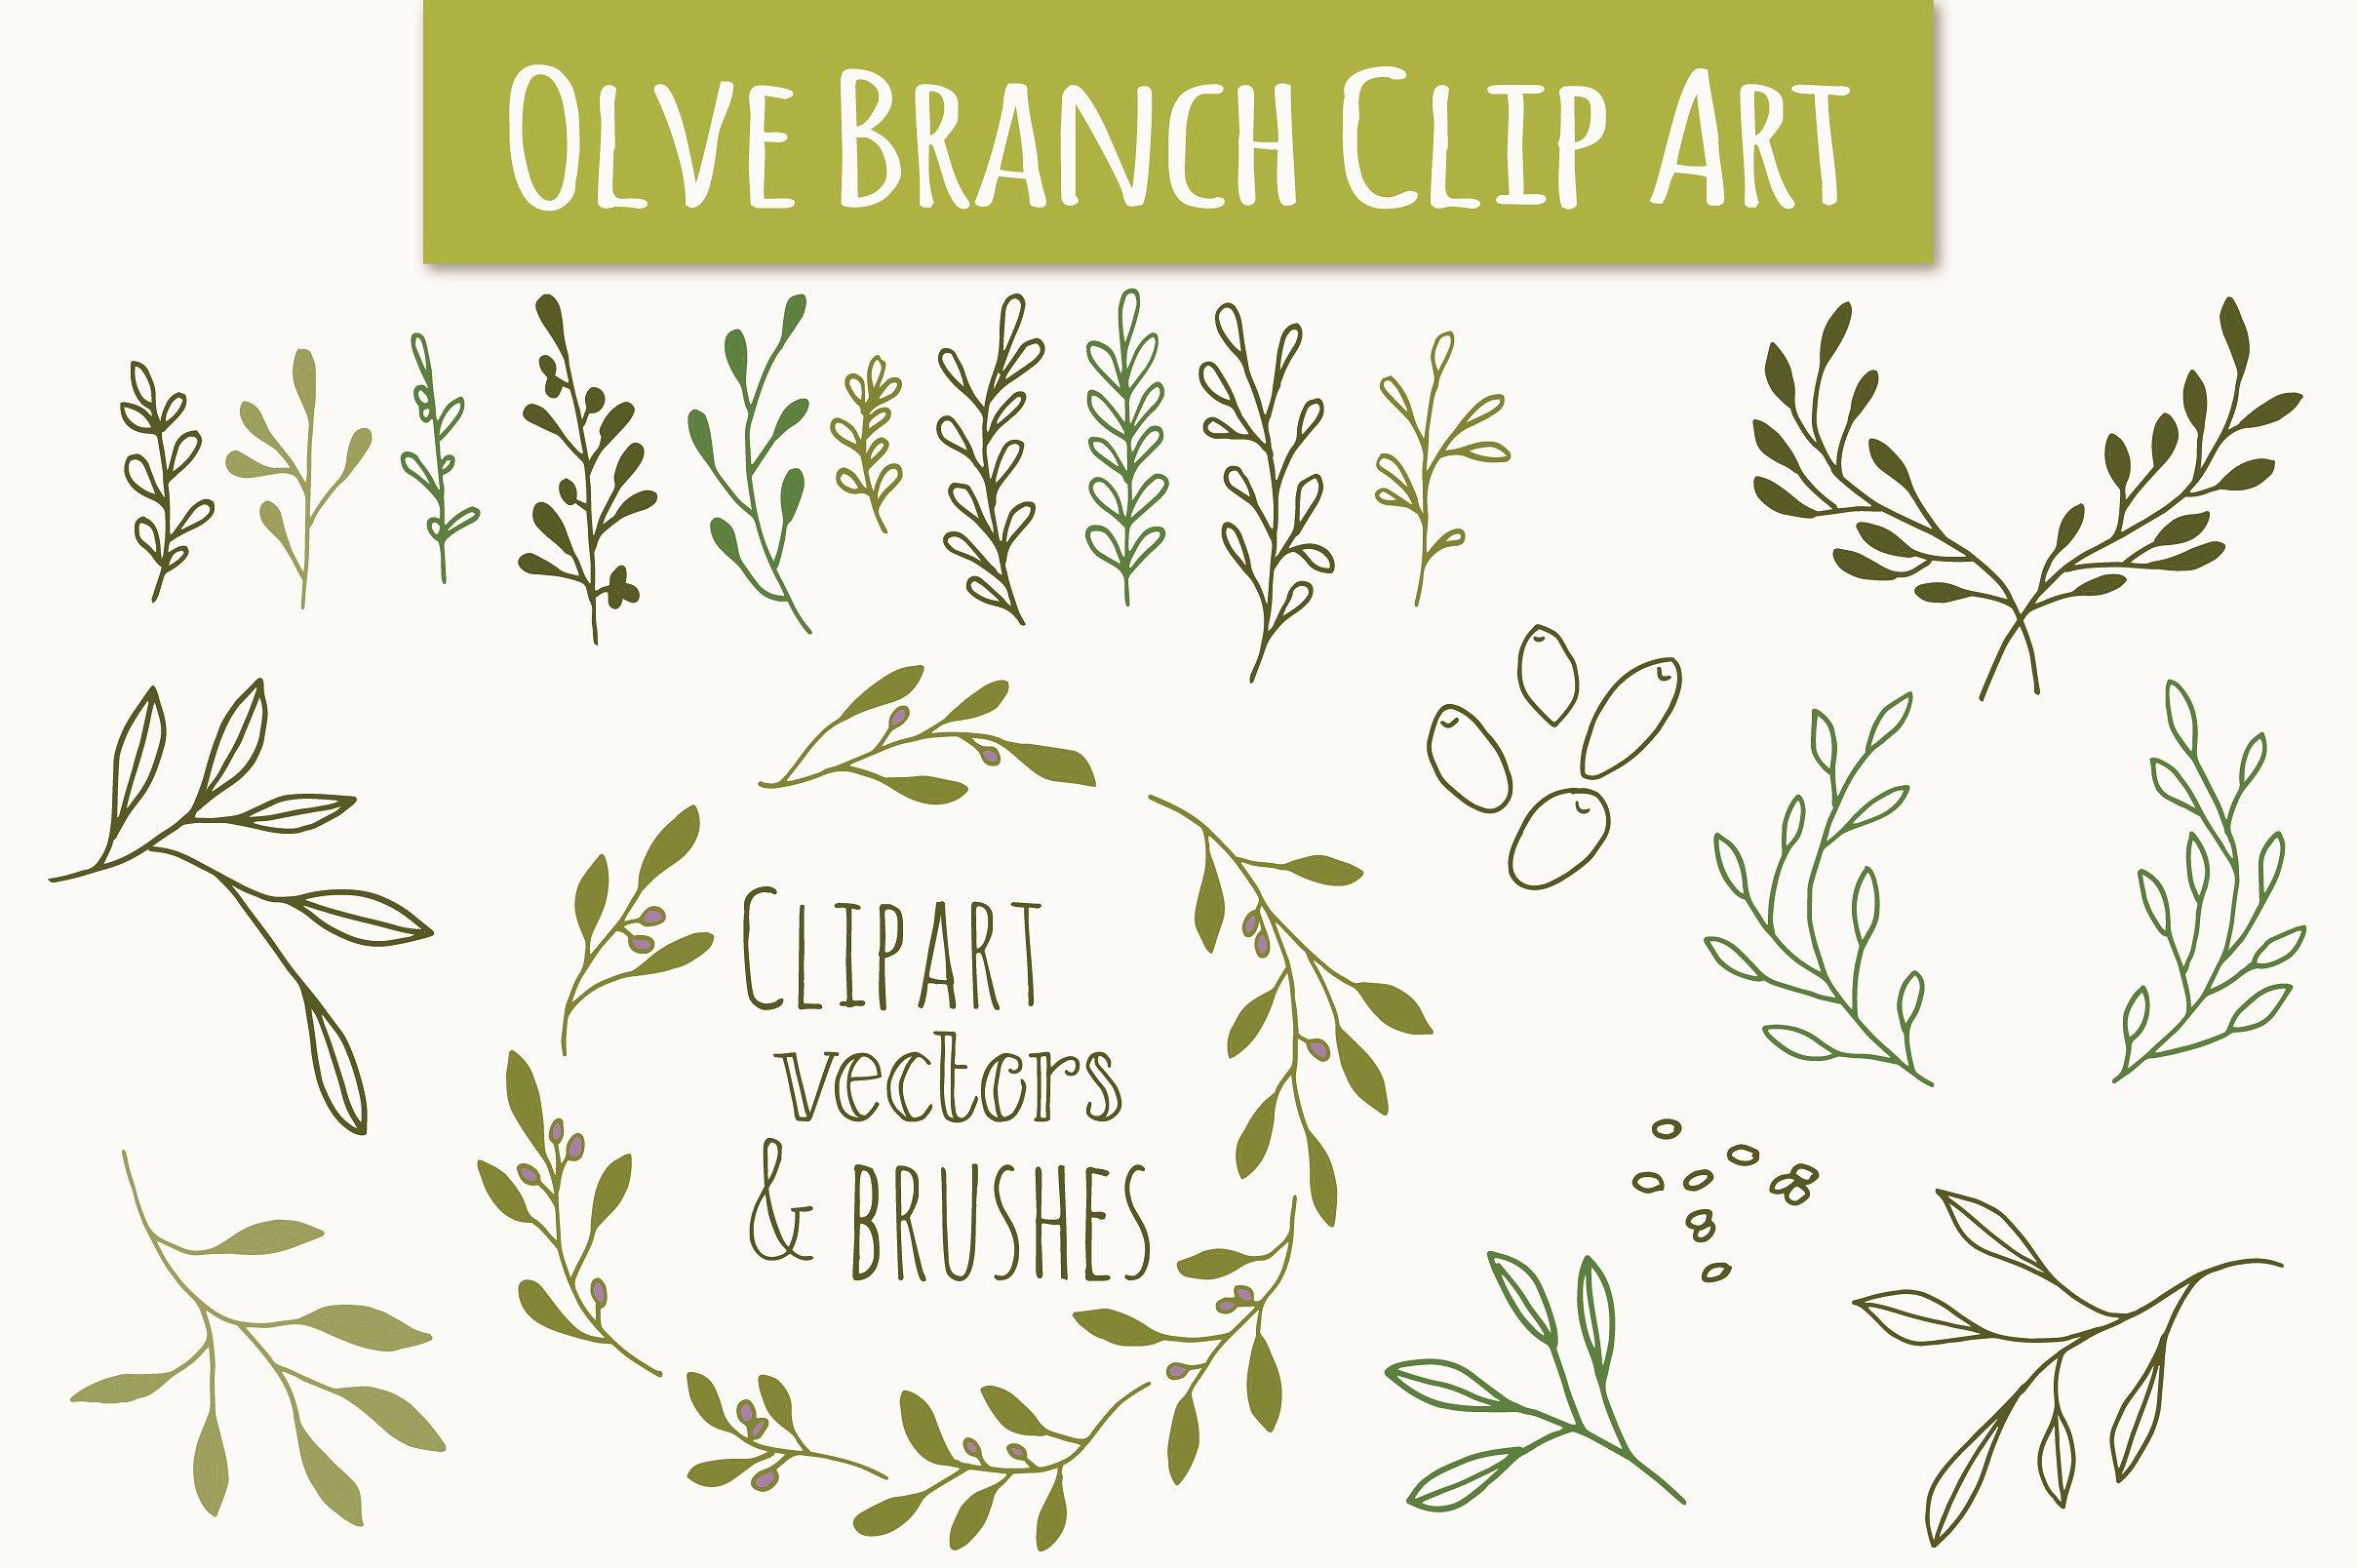 Branch clipart olive branch. Clip art vectors graphics